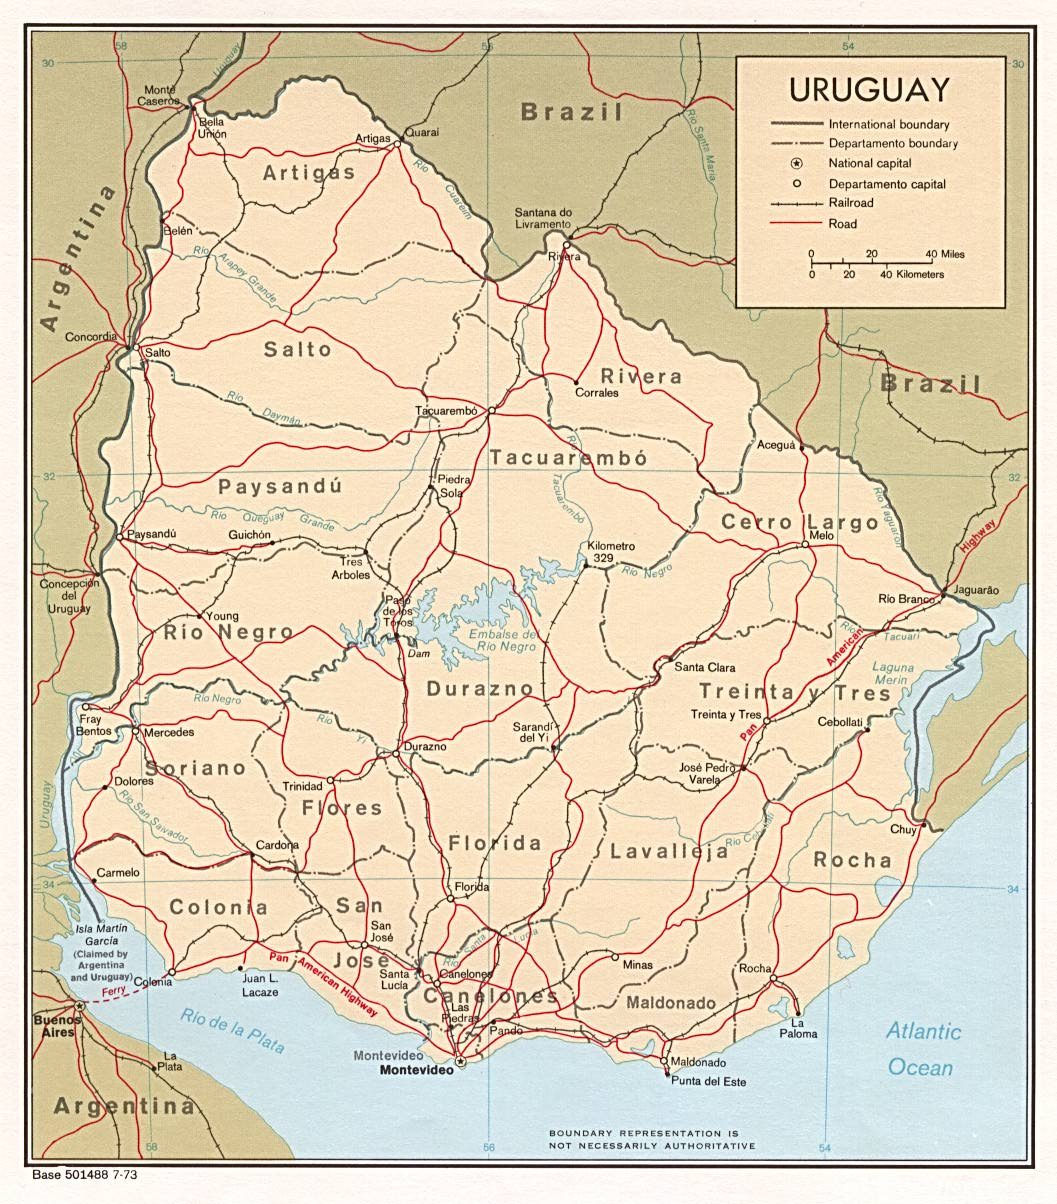 http://www.lib.utexas.edu/maps/americas/uruguay.jpg